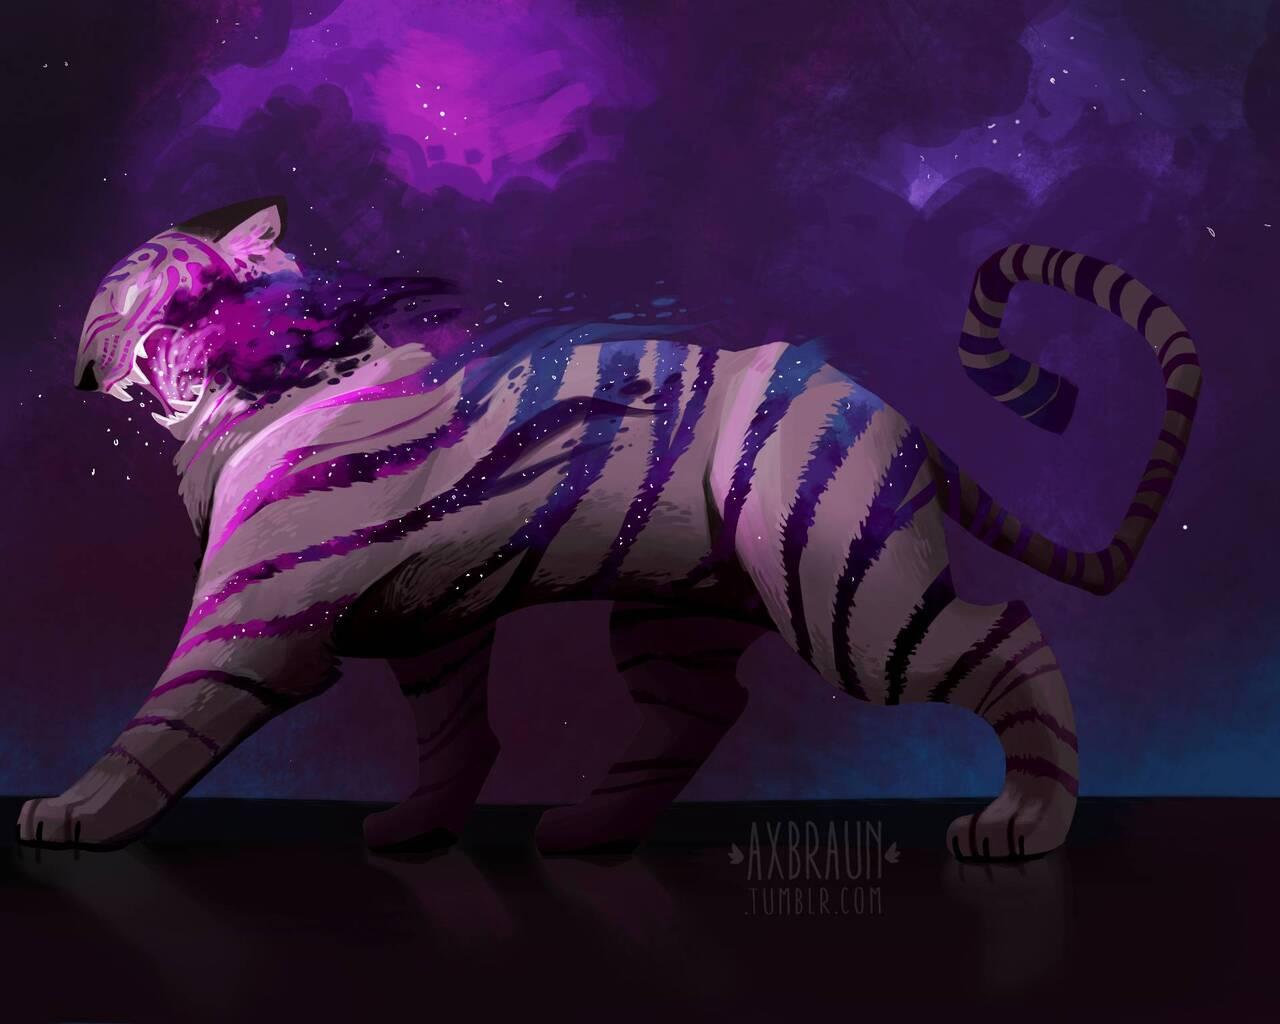 tiger-art-by-alex-braun-ap.jpg